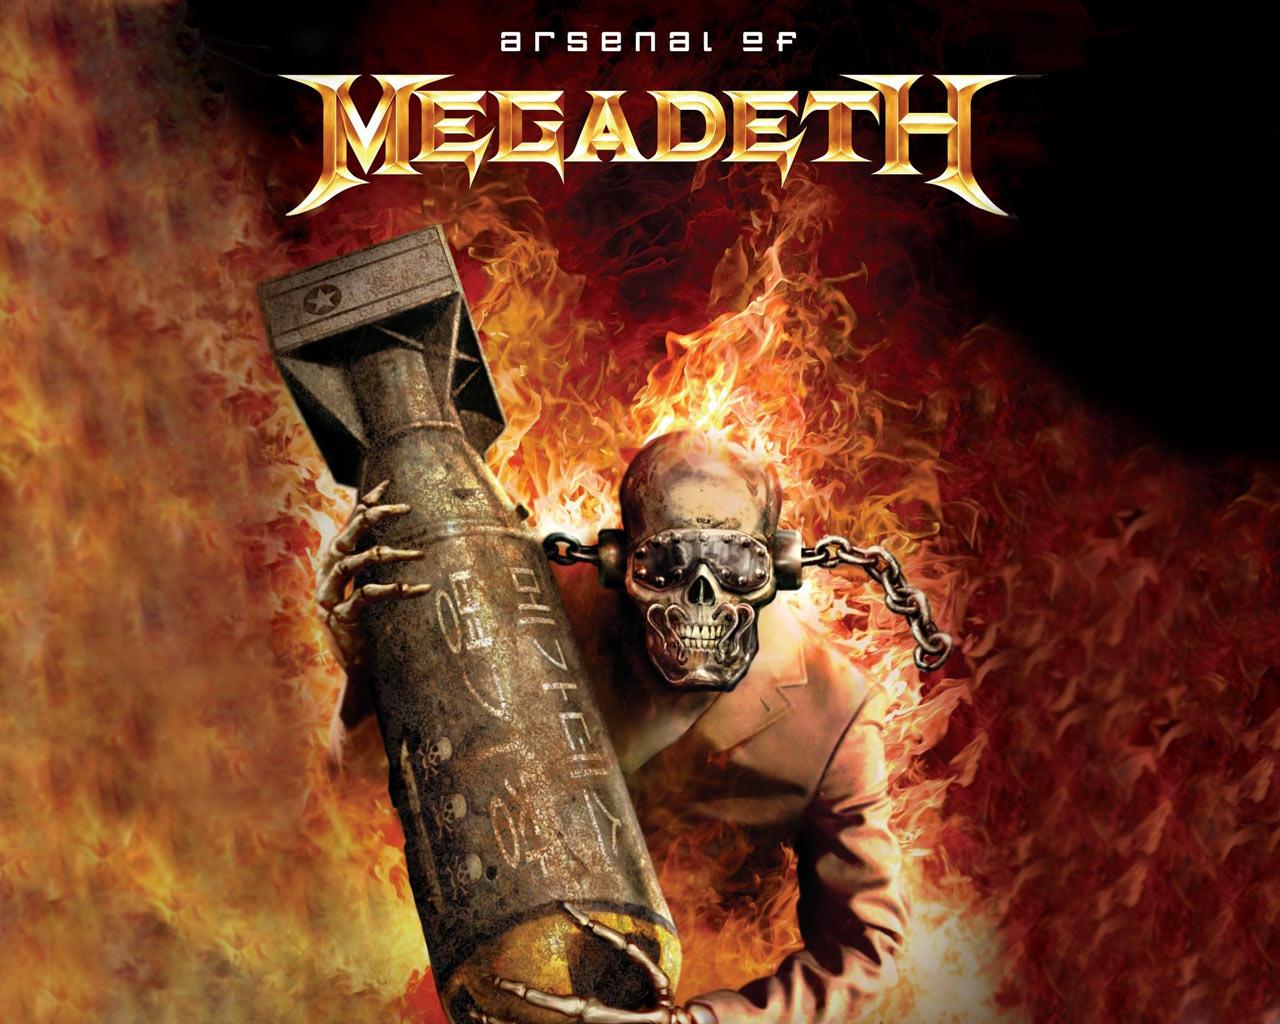 Wallpaper Arsenal Hd Wallpaper Wallpaper Megadeth